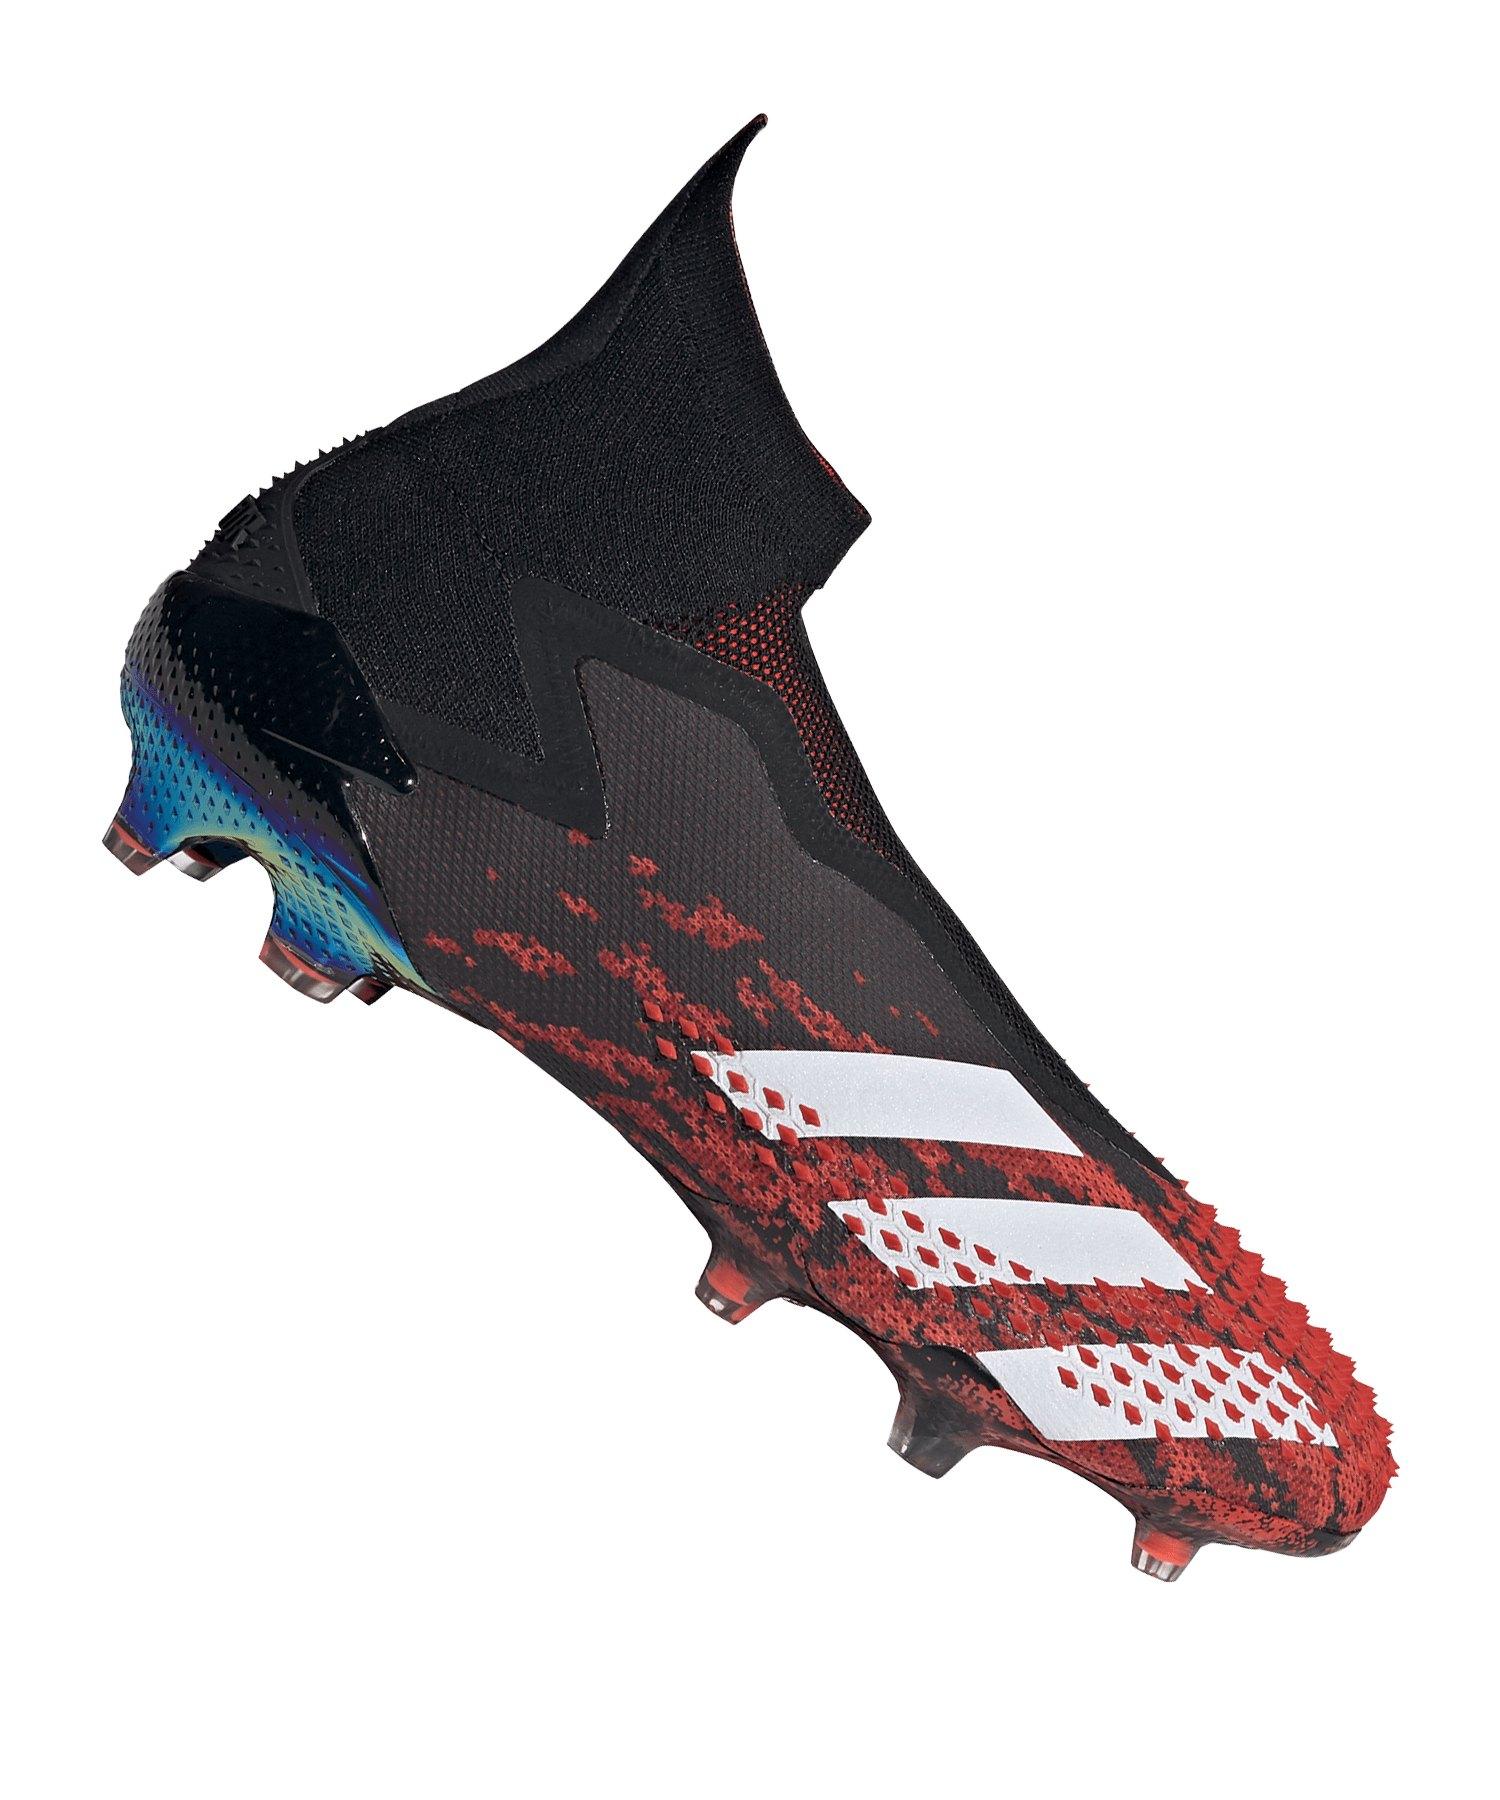 adidas Predator 20+ FG Schwarz Rot